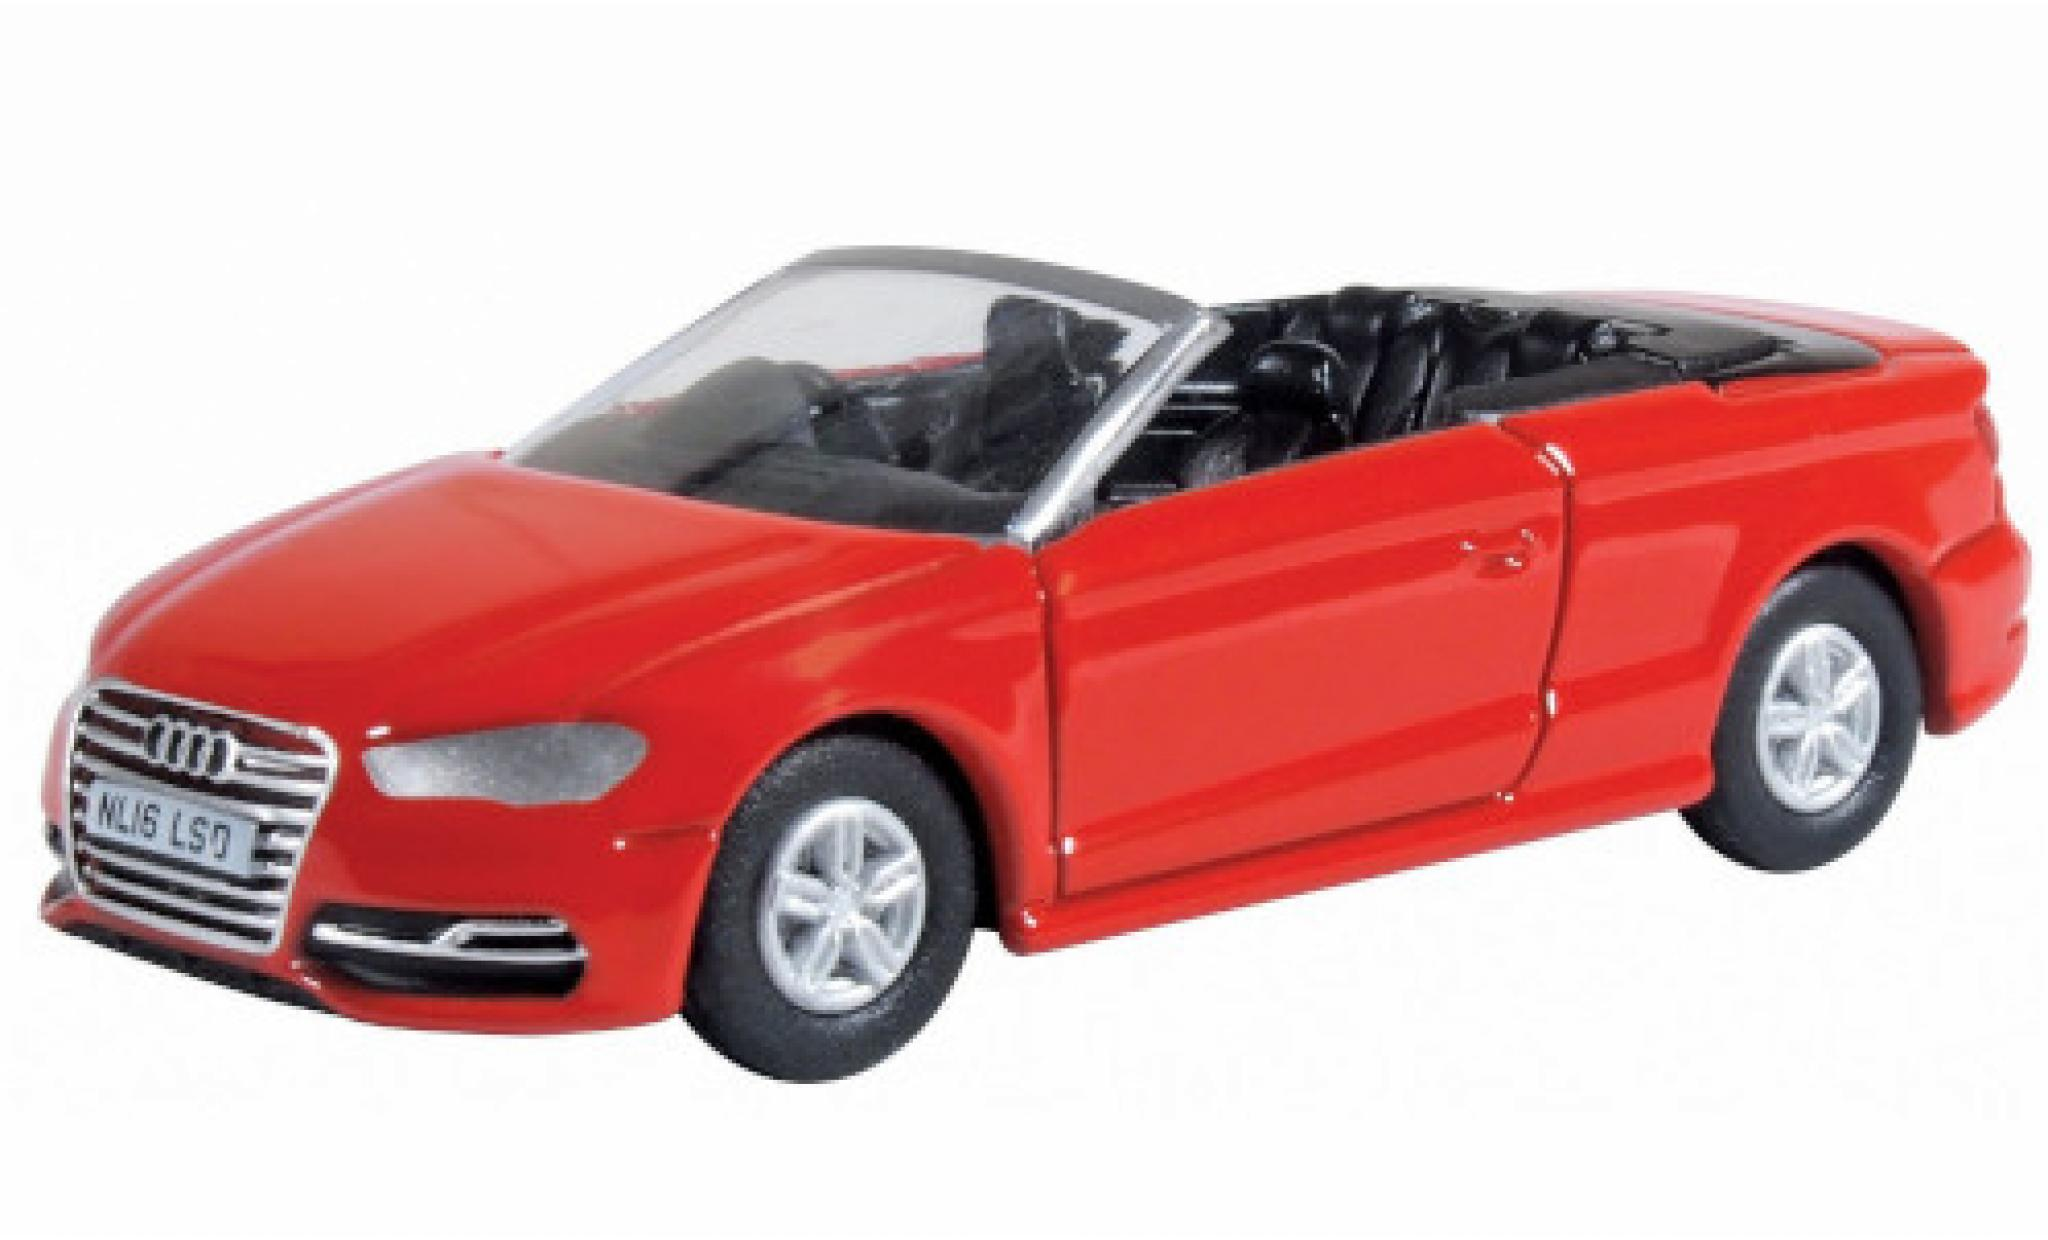 Audi S3 1/76 Oxford Cabriolet red RHD